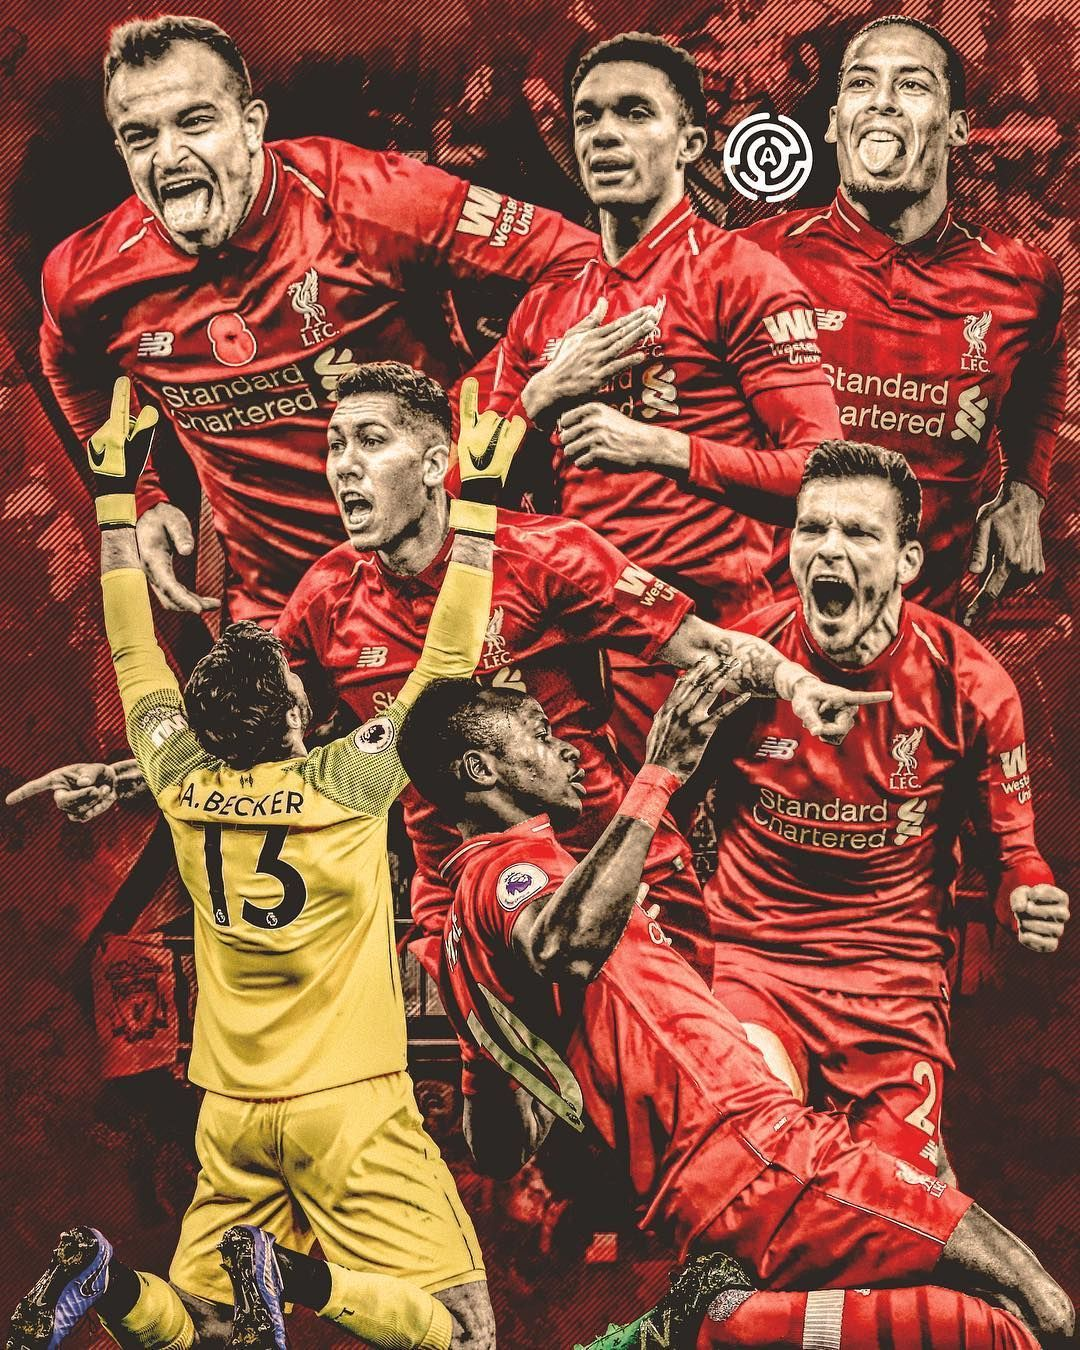 Liverpool Premier League Champions 2020 Wallpapers - Wallpaper Cave